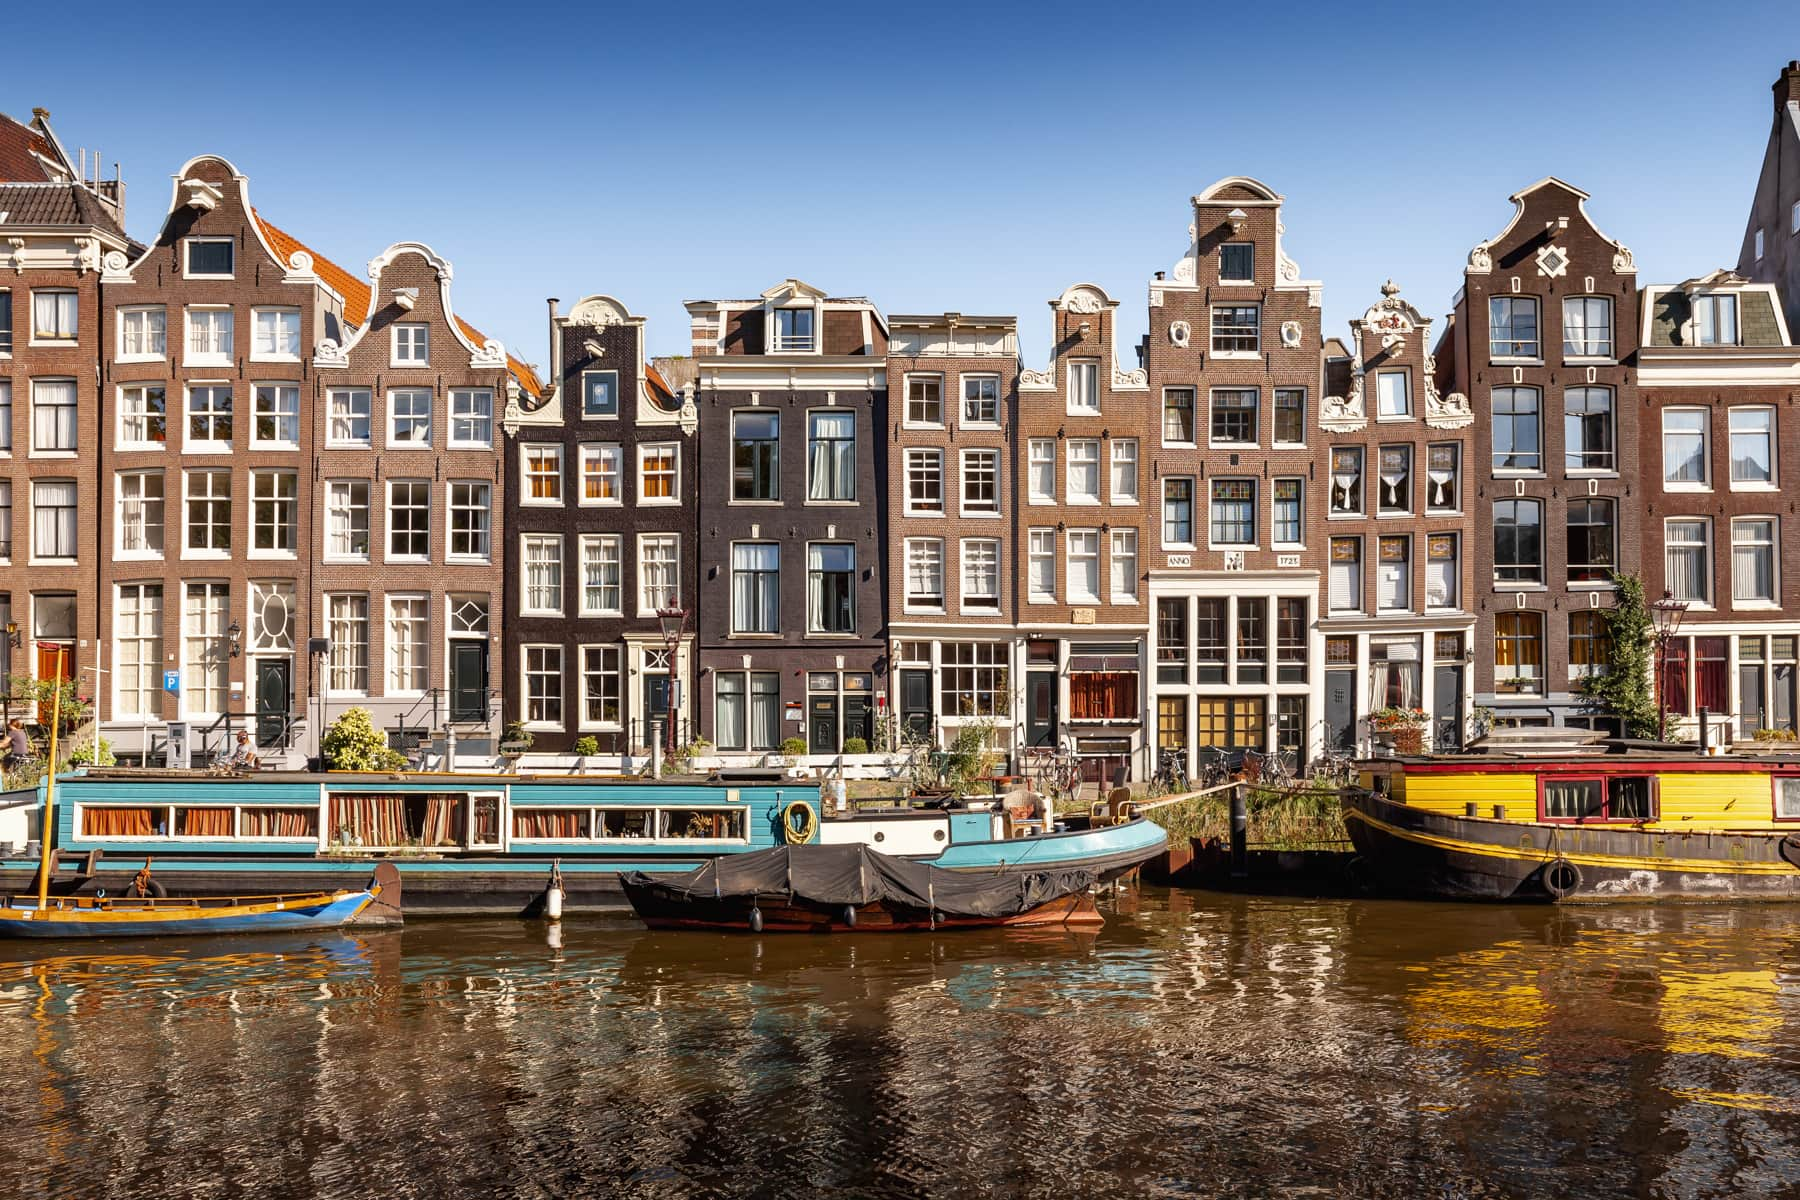 Singel Gracht in Amsterdam, Niederlande